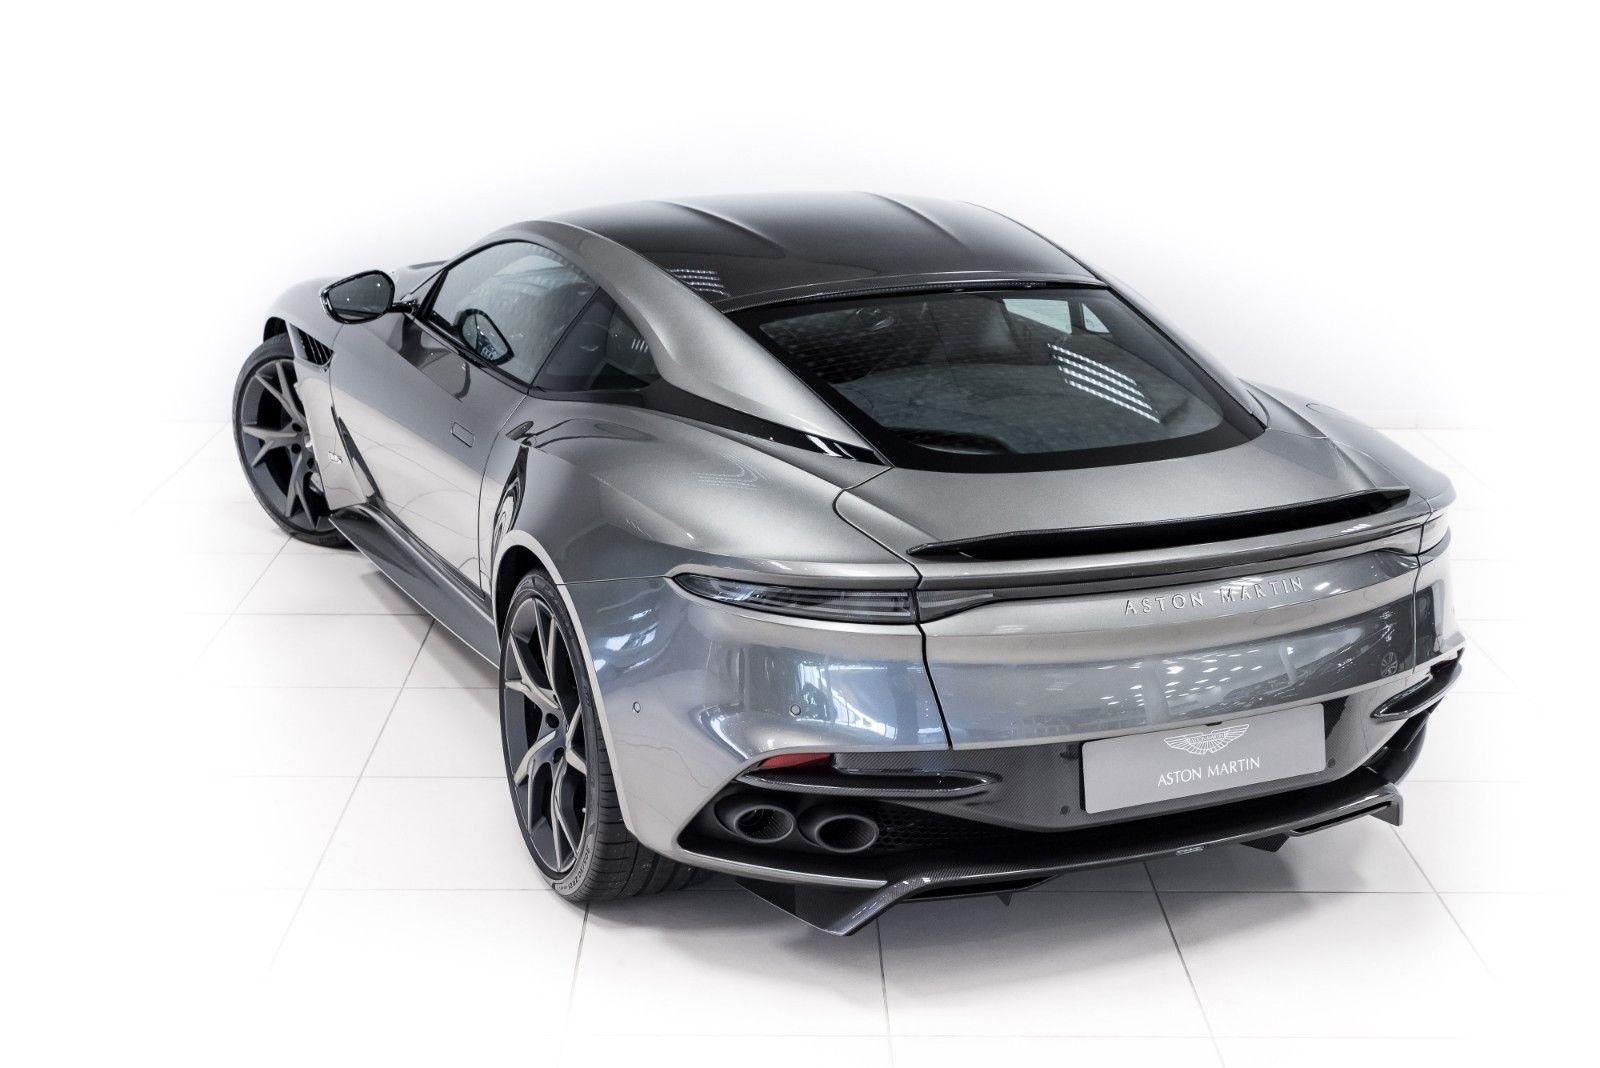 Aston Martin Dbs Superleggera Coupe Scintilla Silver By Q Luxury Pulse Cars Netherlands For Sale On Luxurypuls Superleggera Aston Martin Dbs Aston Martin